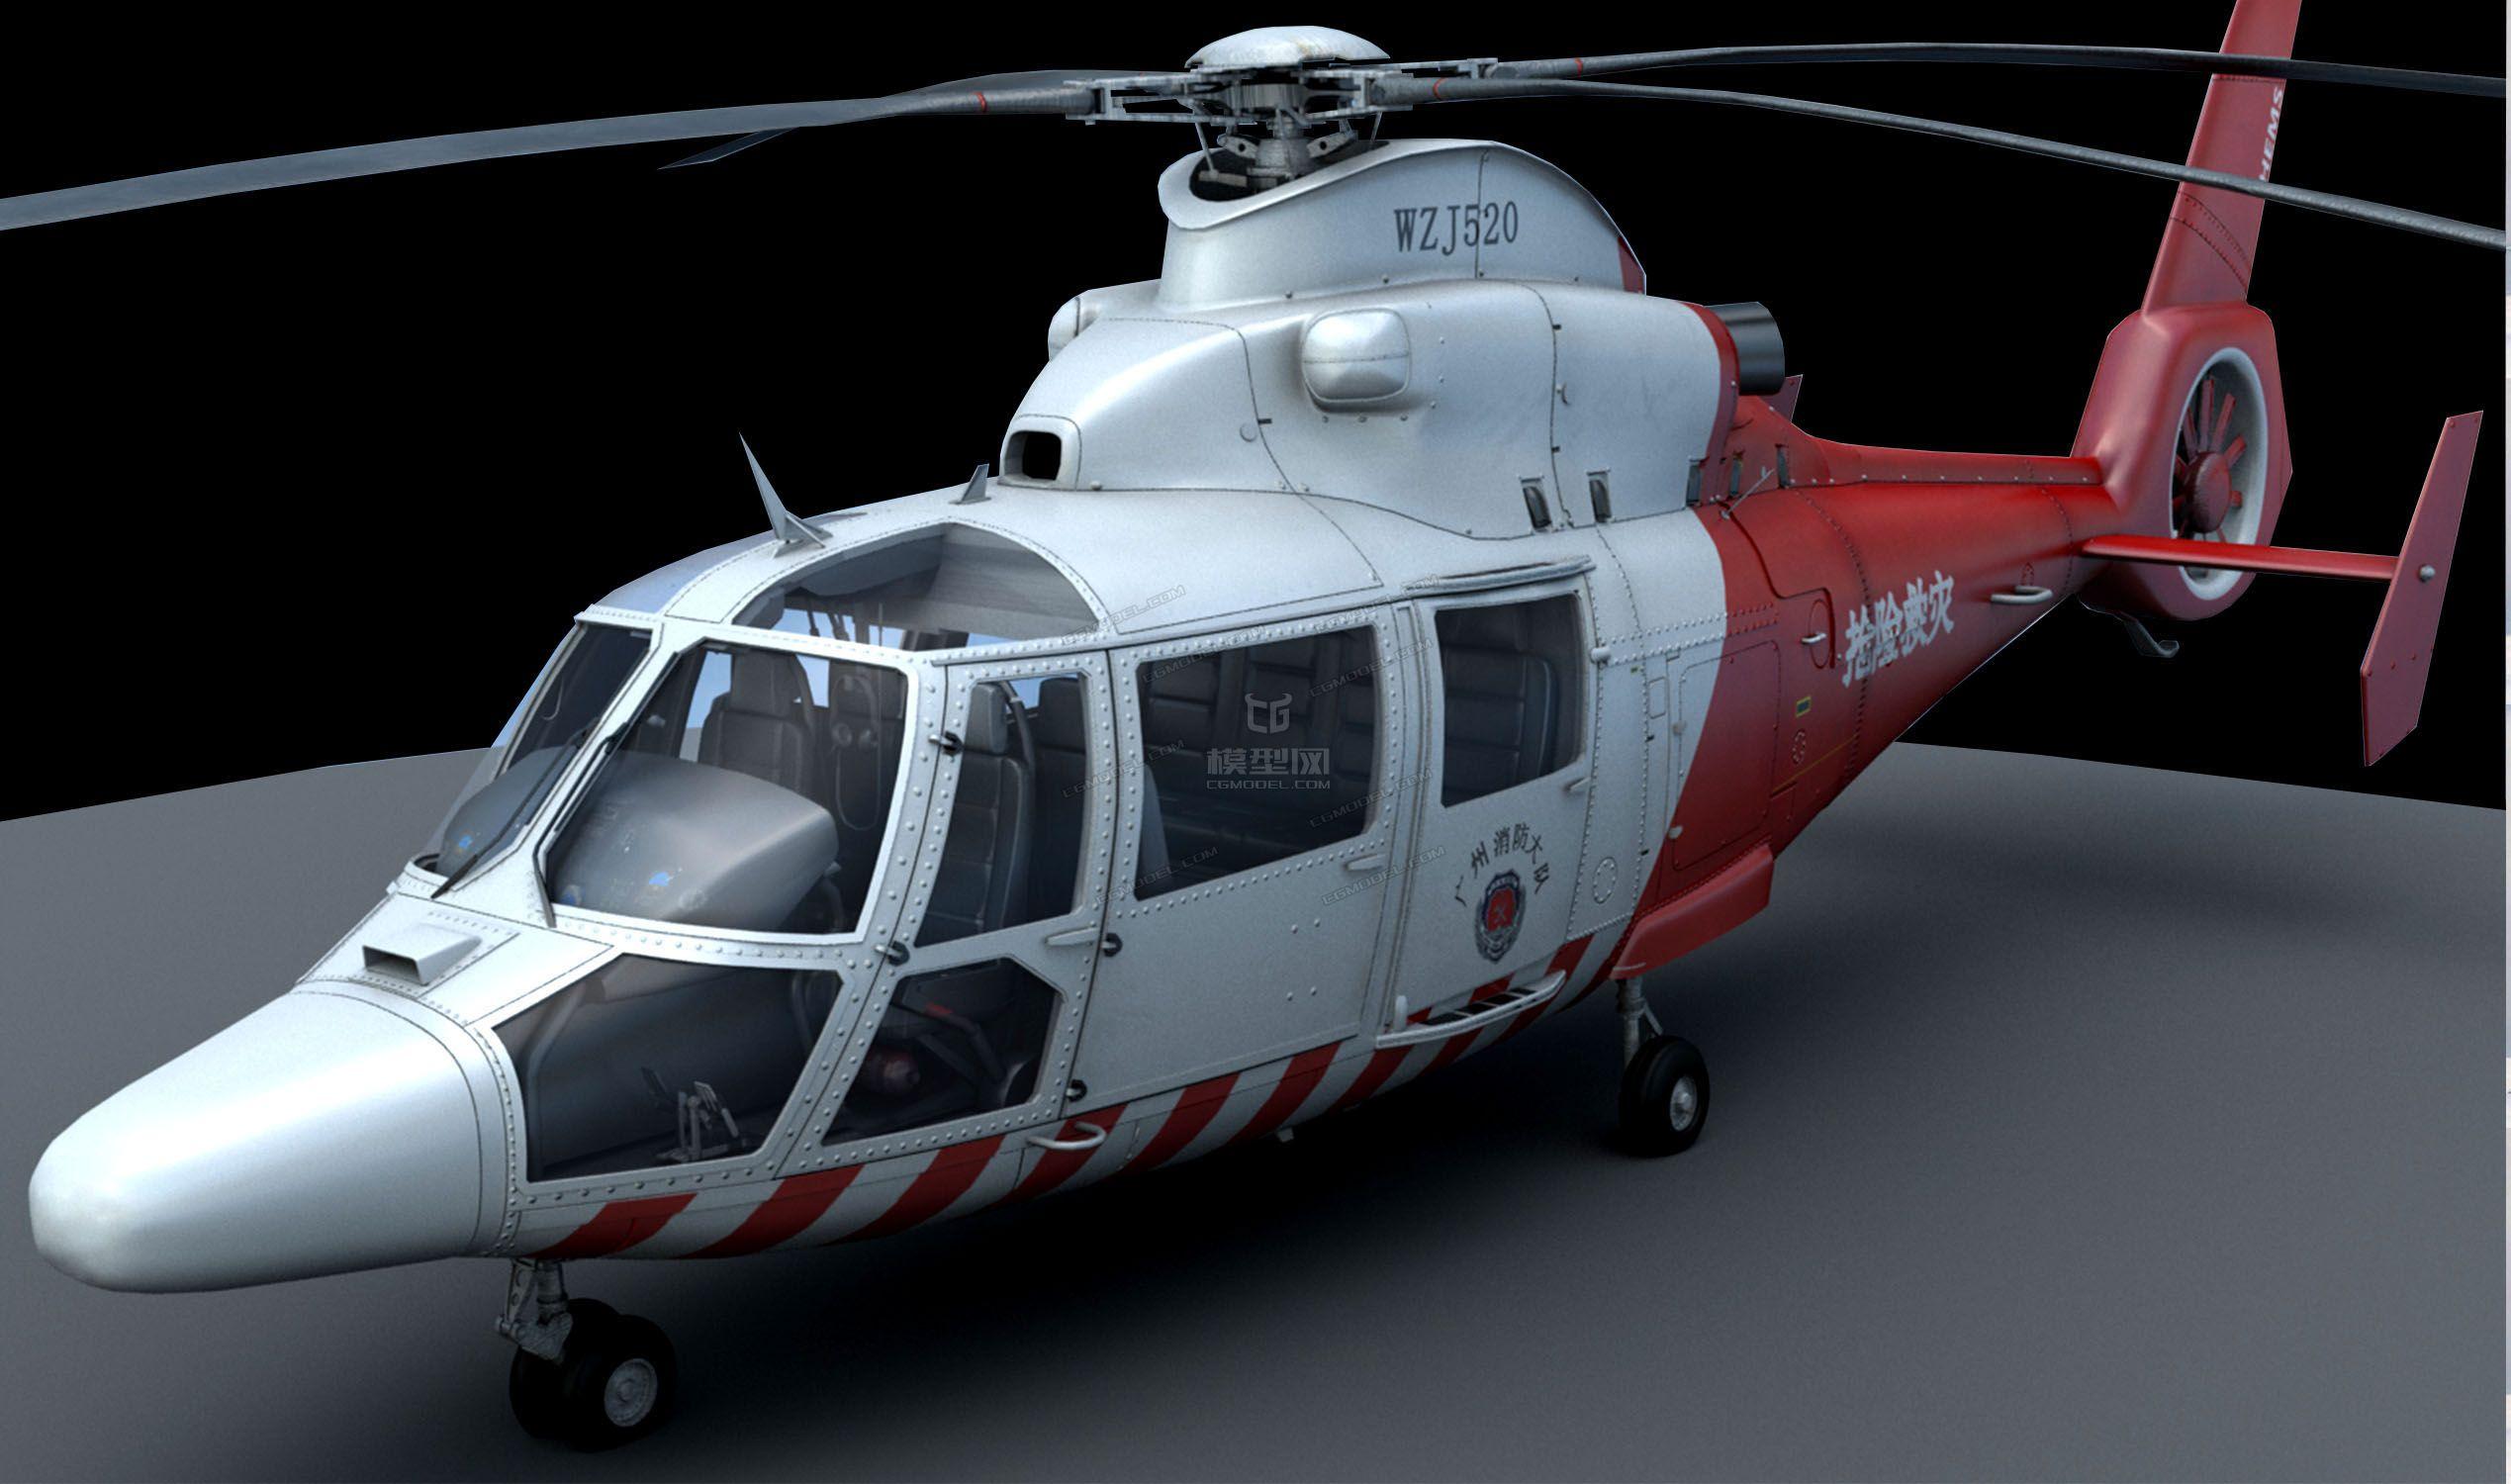 qq网络电话机_高精度救援直升机-军用直升机-飞机/航空器-798635097-CG模型网